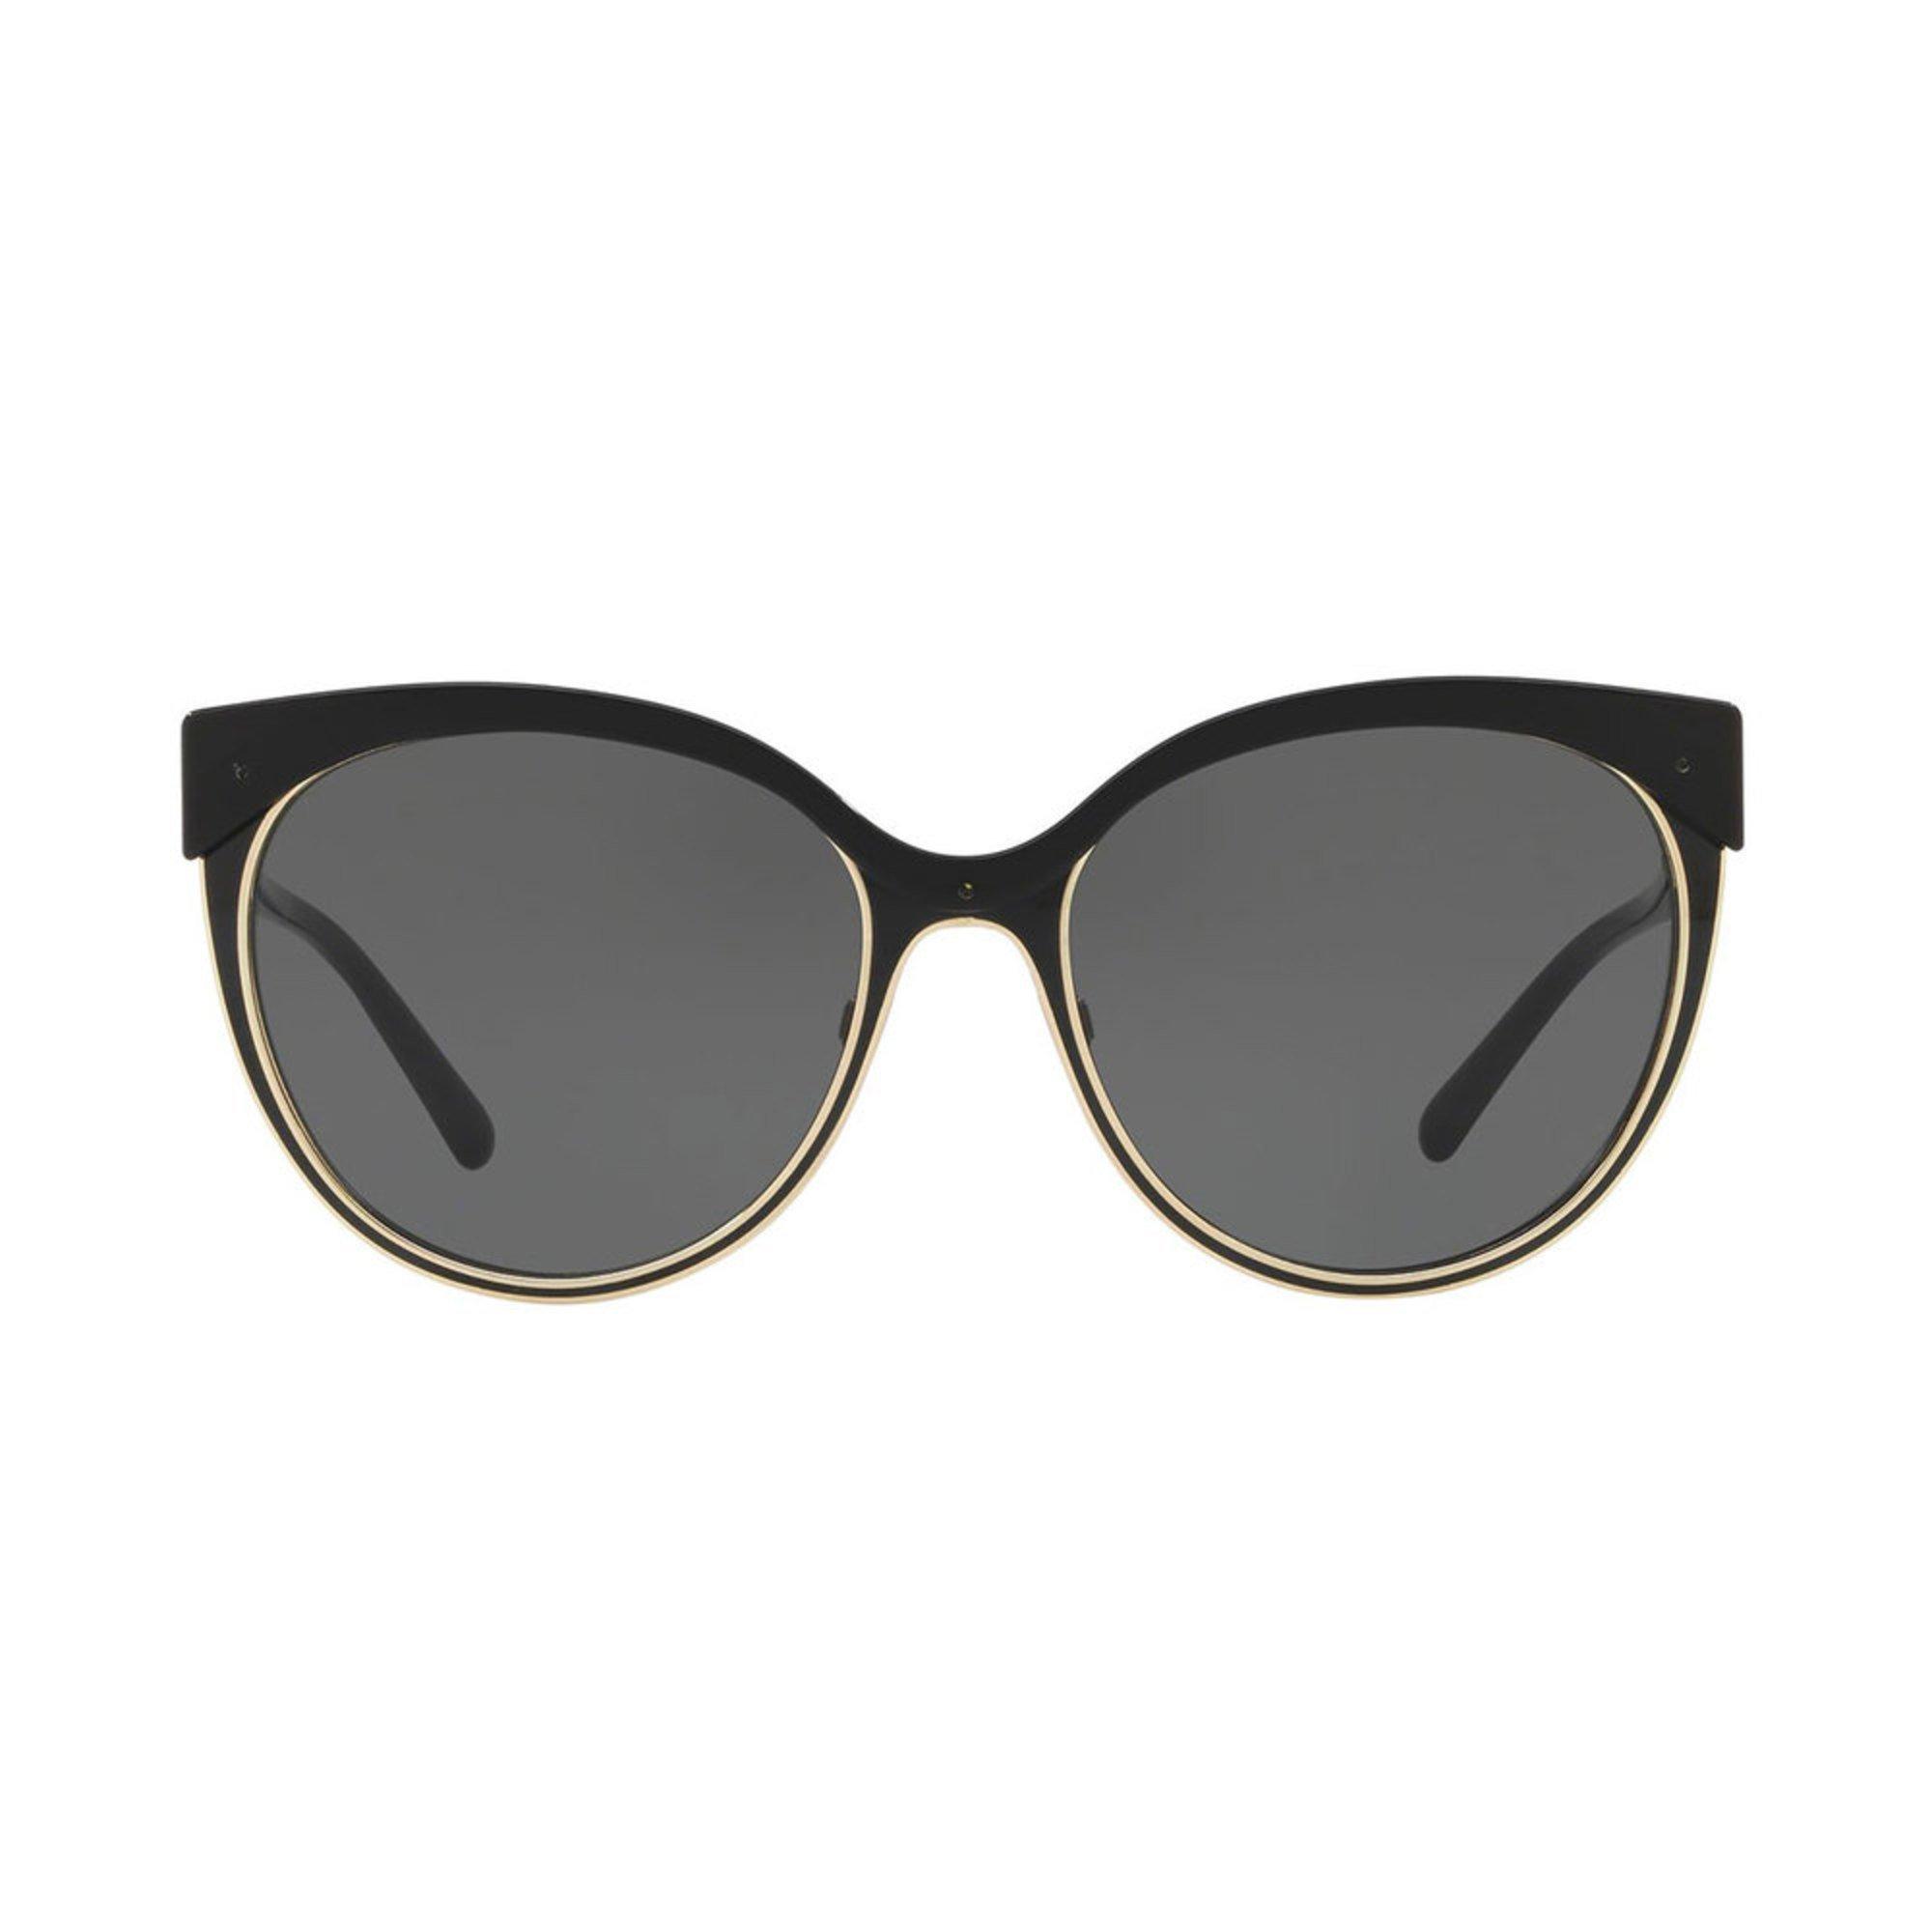 0bc739c4d126 Burberry. Burberry Women s Cat Eye Black Light Gold Sunglasses 55mm